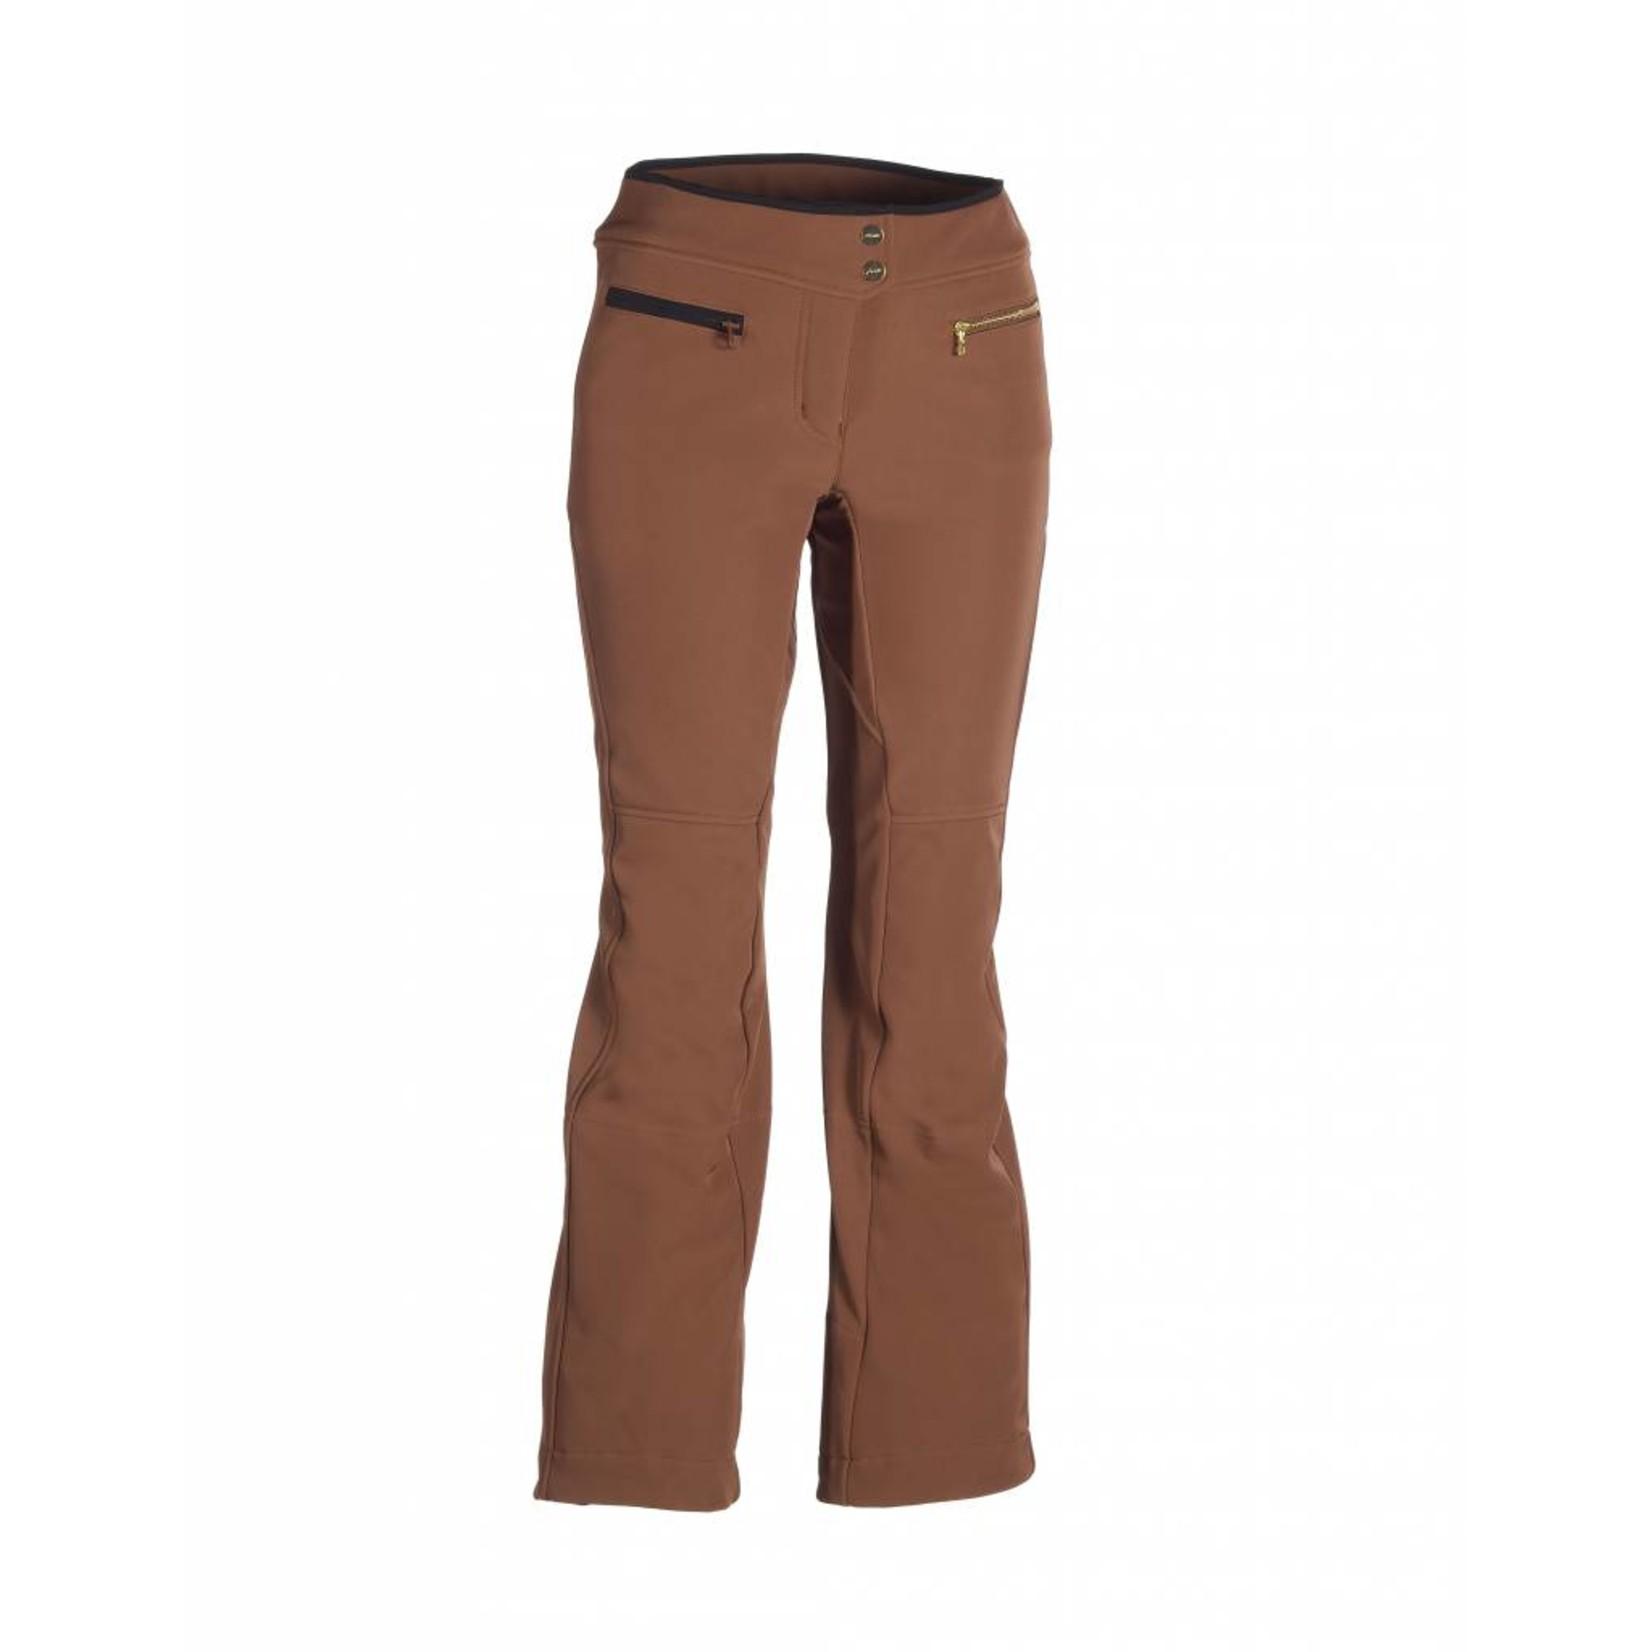 PHENIX Jet Pants - BR